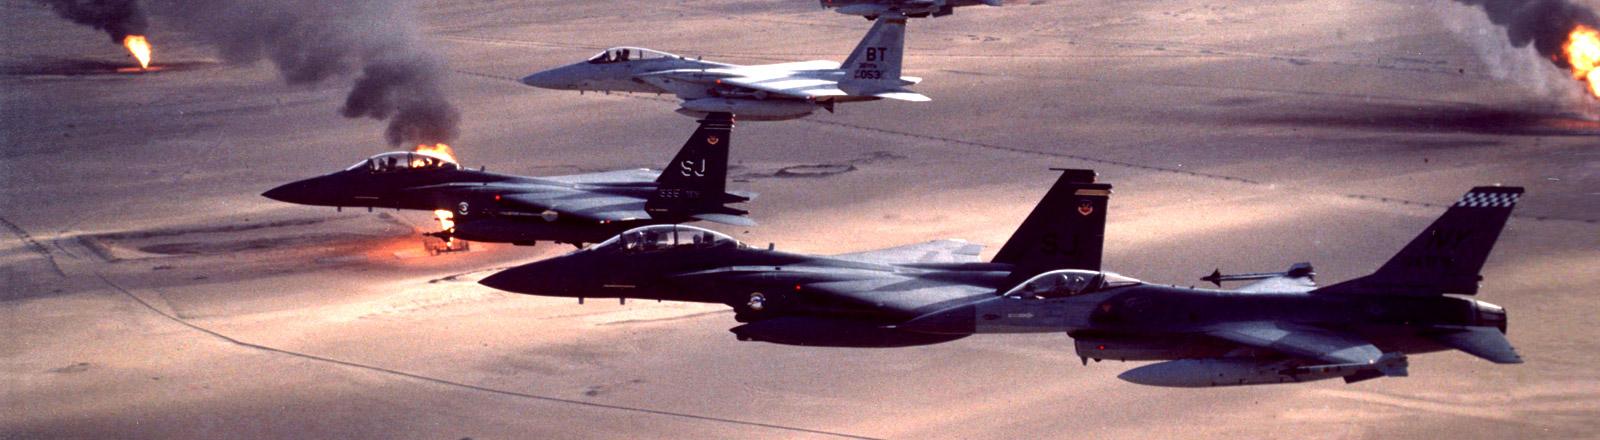 Kampfflugzeuge fliegen die Operation Desert Storm